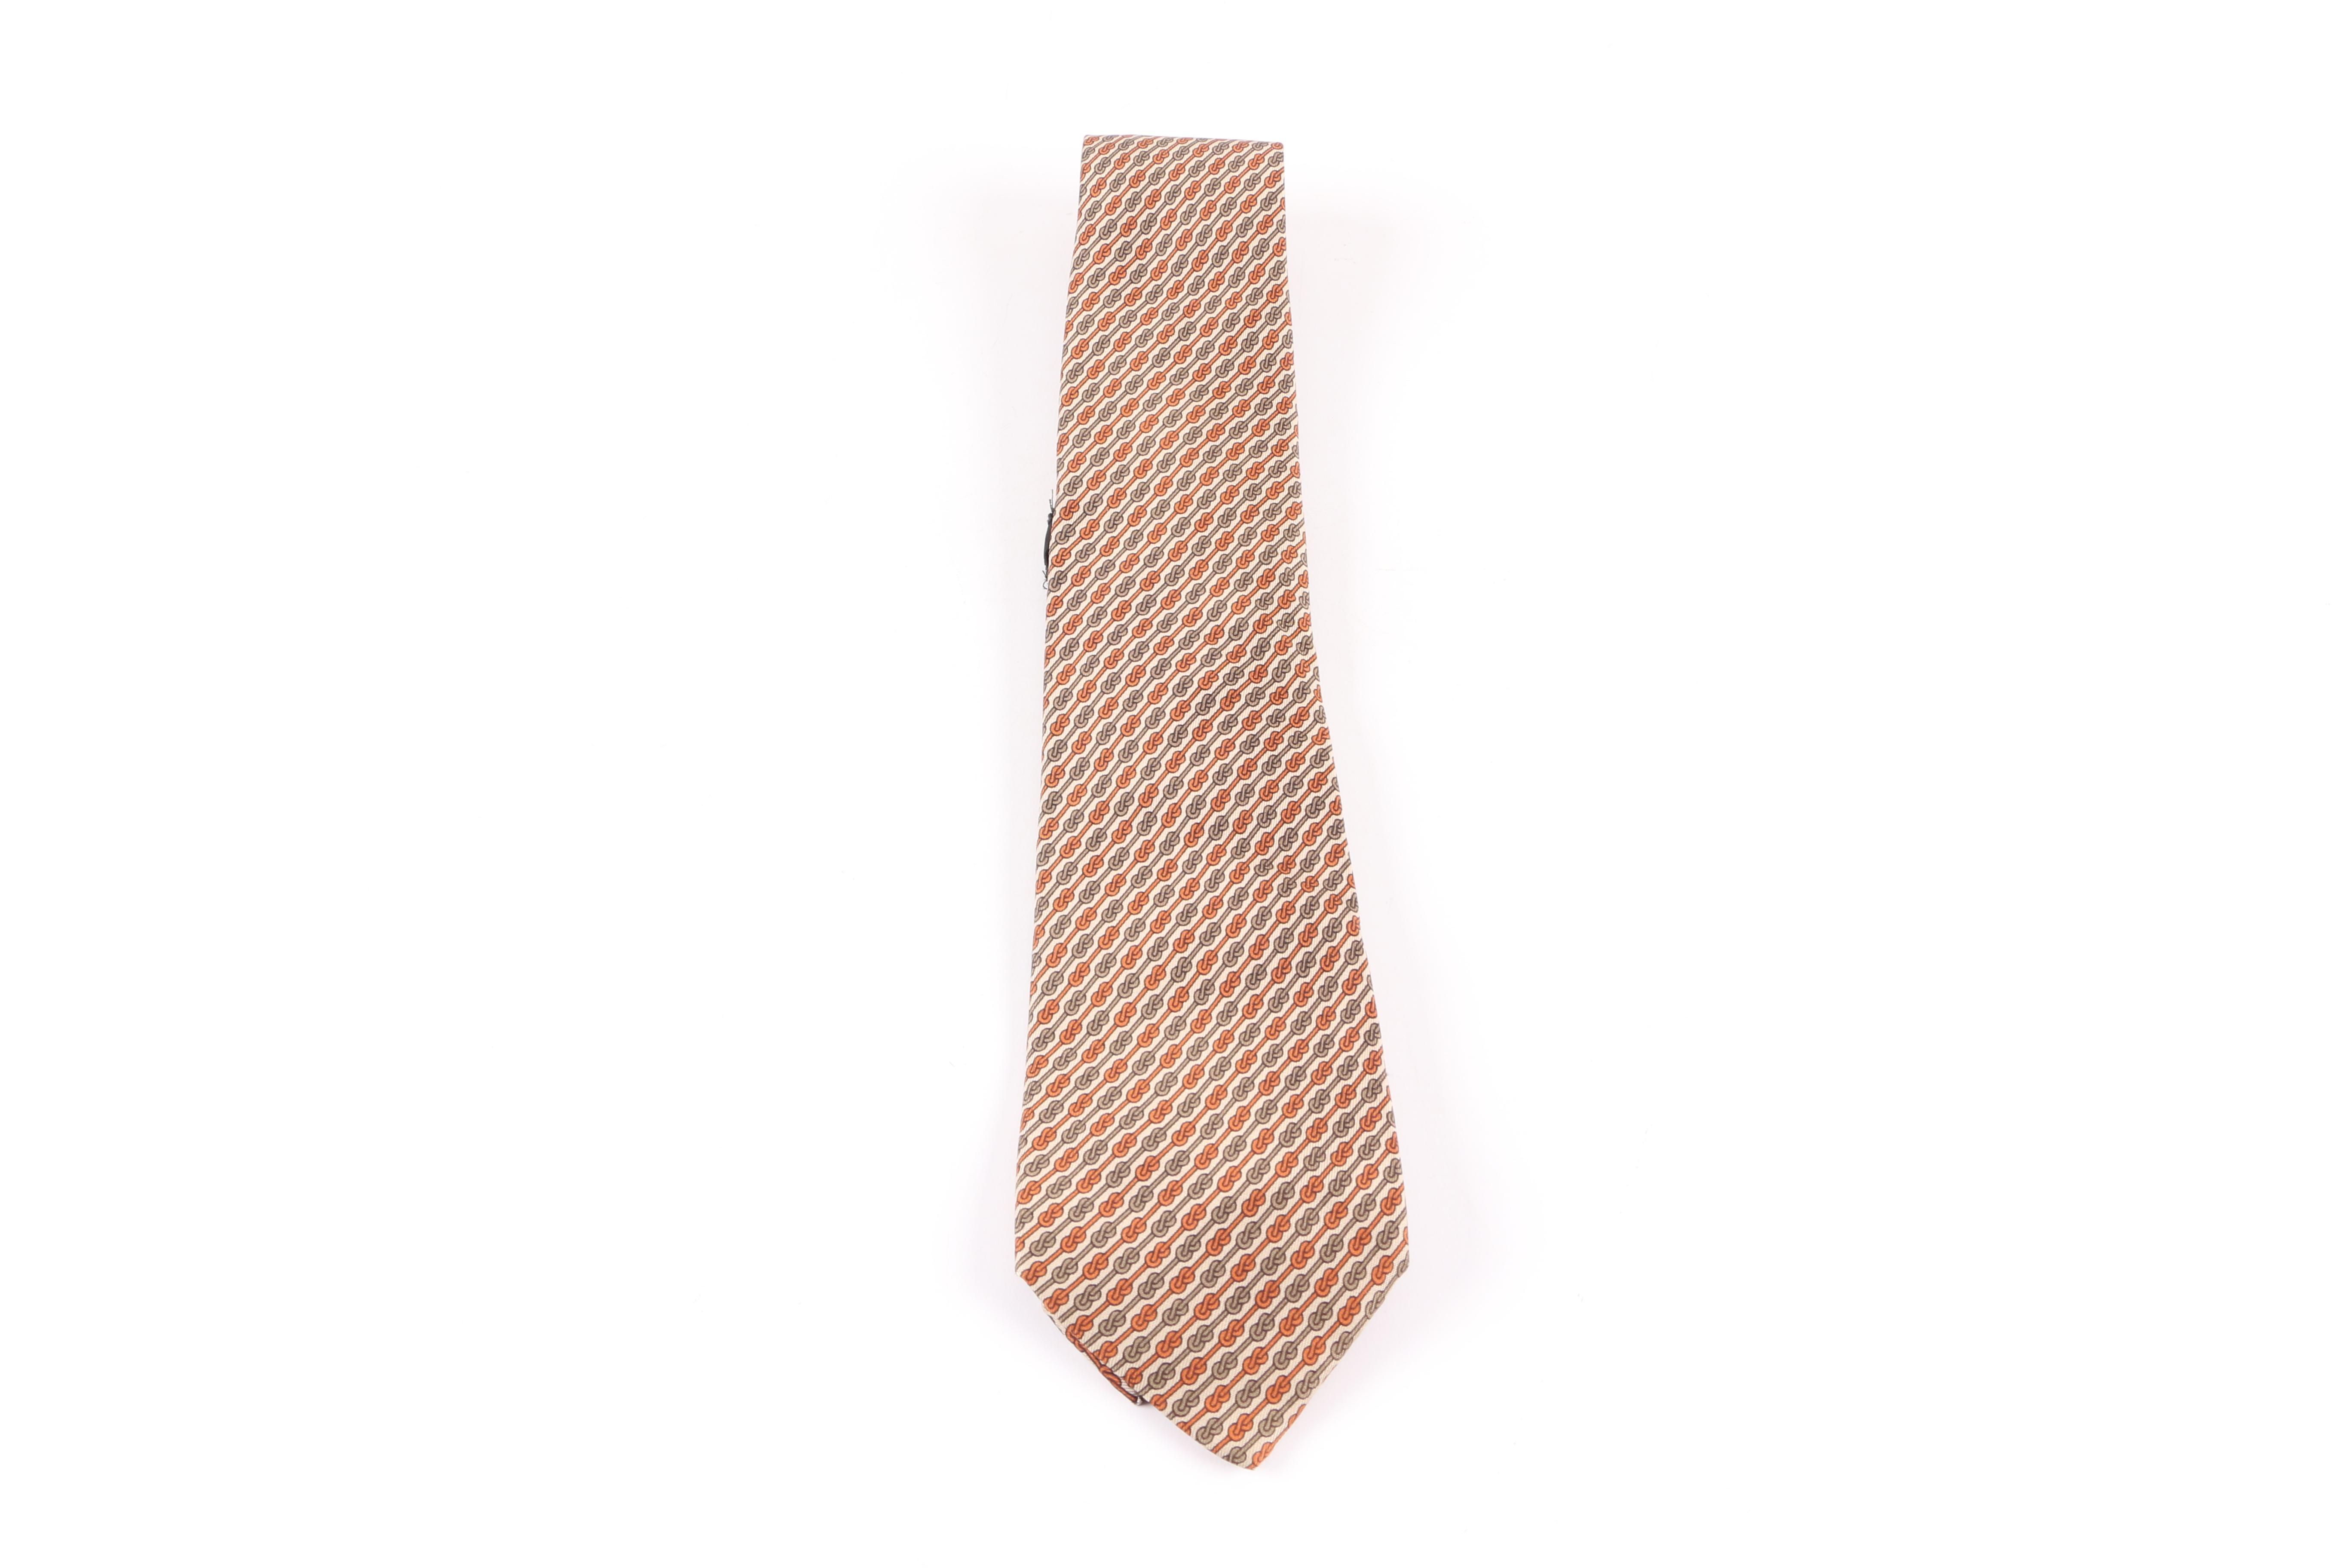 Vintage Gucci Silk Necktie, Made in Italy